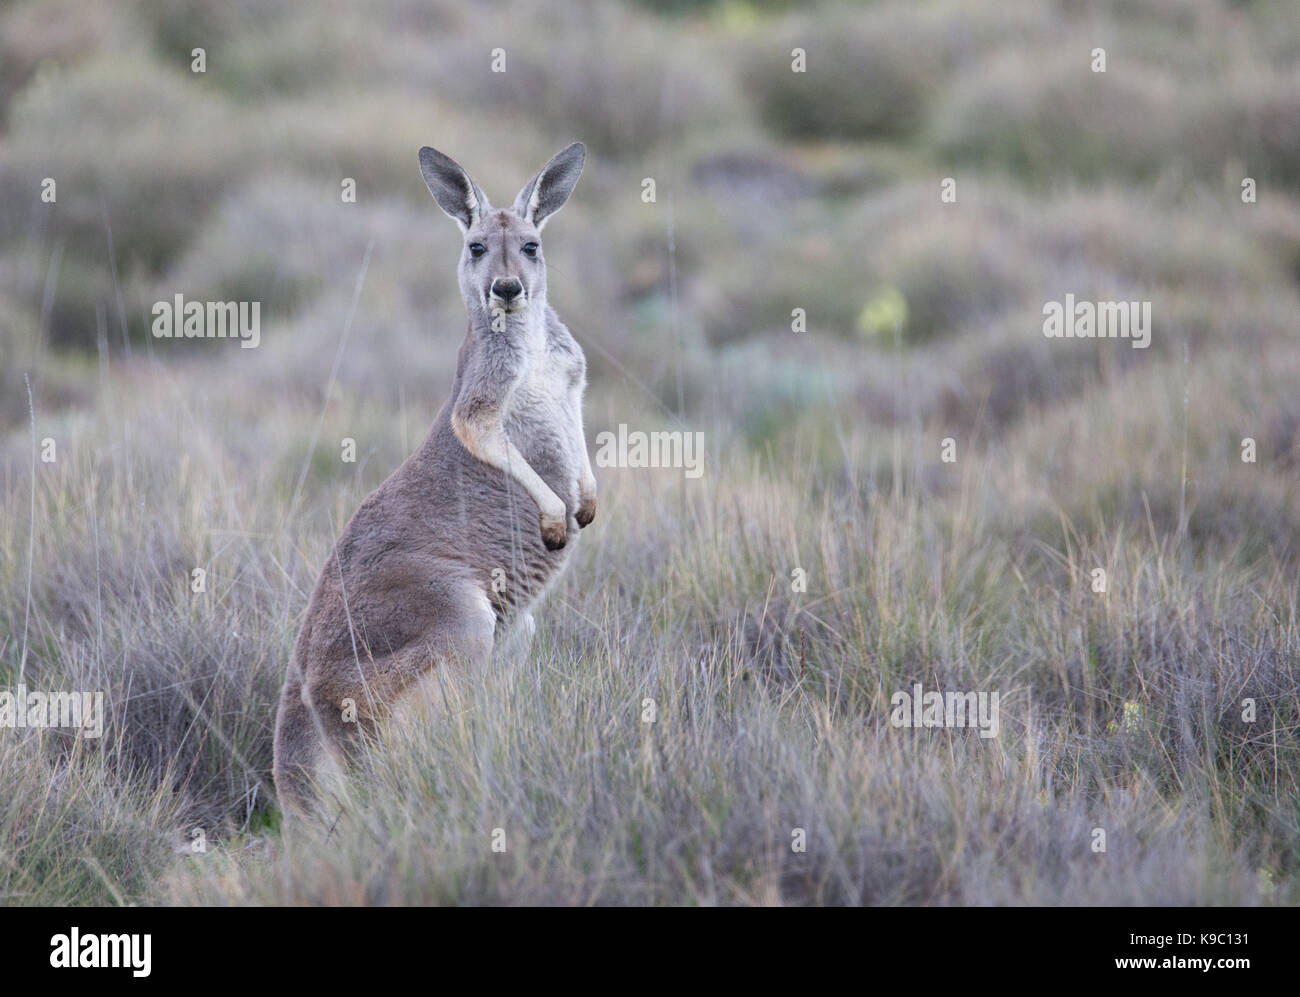 Red Kangaroo (Macropus rufus), Flinders Ranges, South Australia - Stock Image